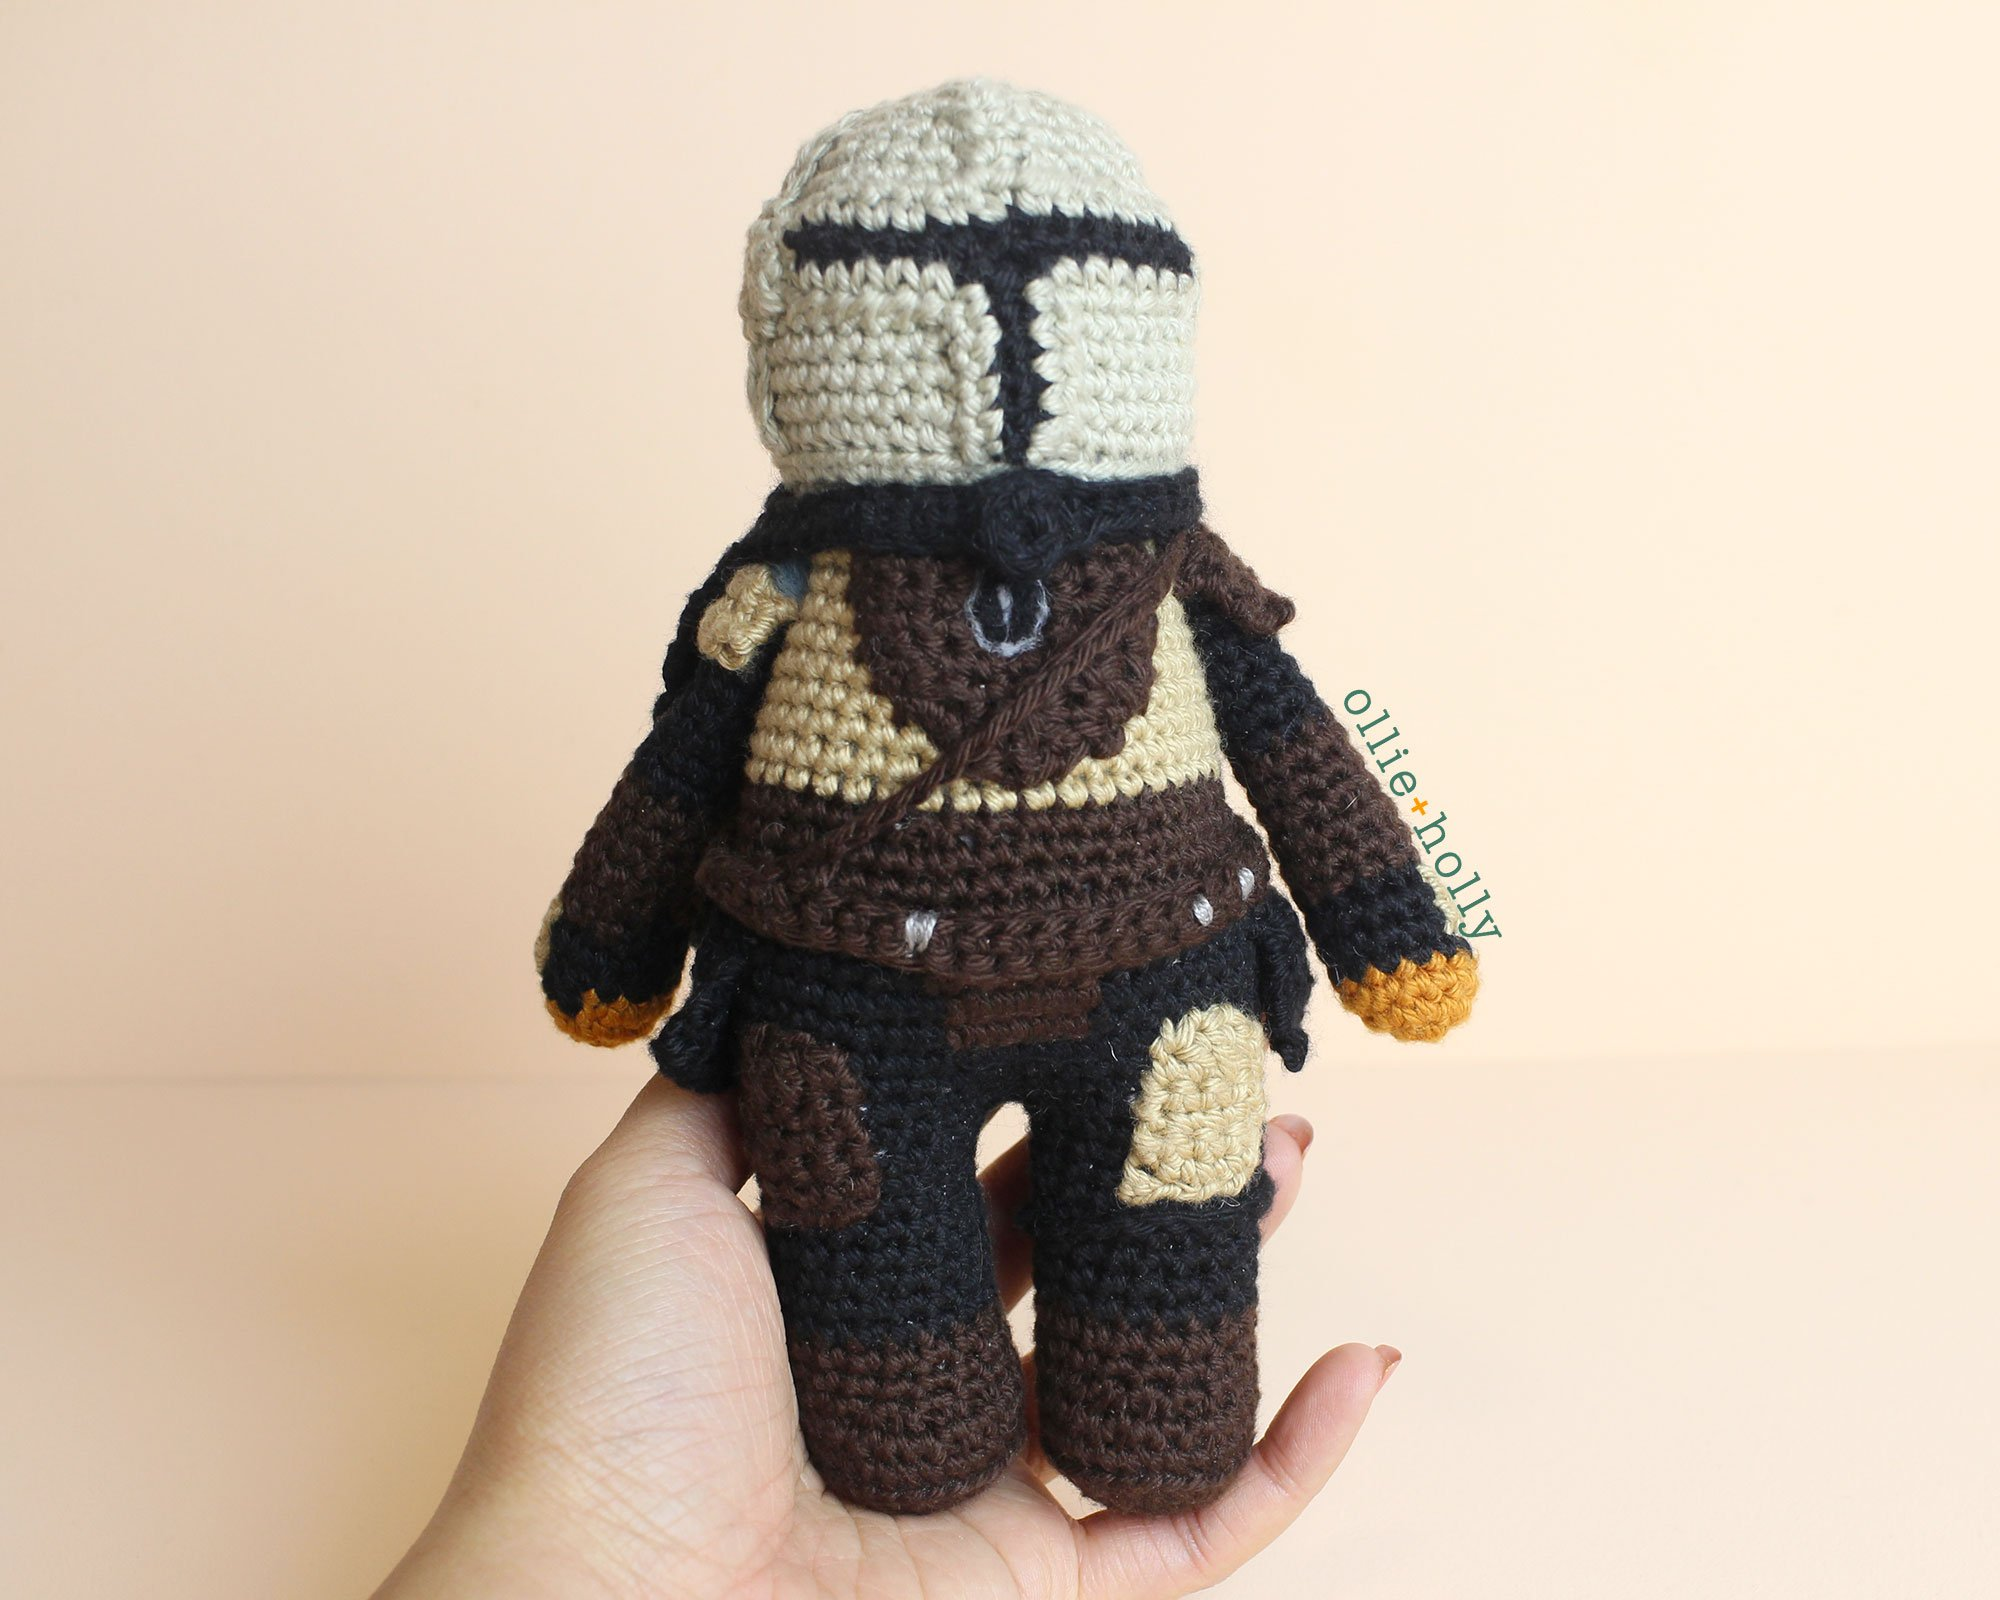 Free Mandalorian Din Djarin Amigurumi Crochet Pattern Assembly Complete